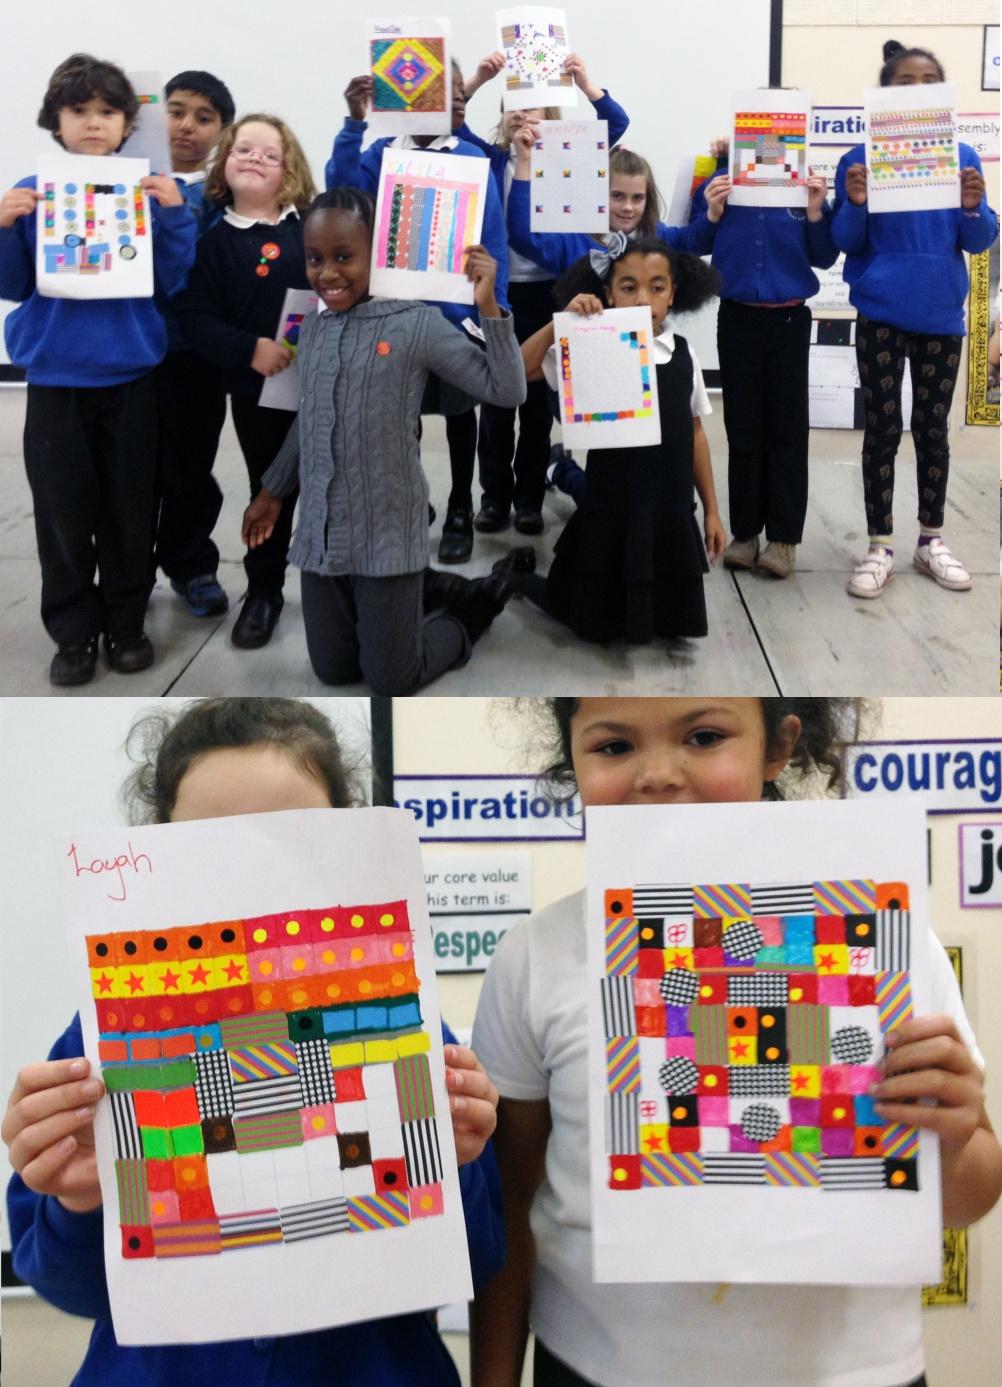 Children of Glenfrome Primary School, Eastville, showcasing their patterns for the Wonder Pavilion